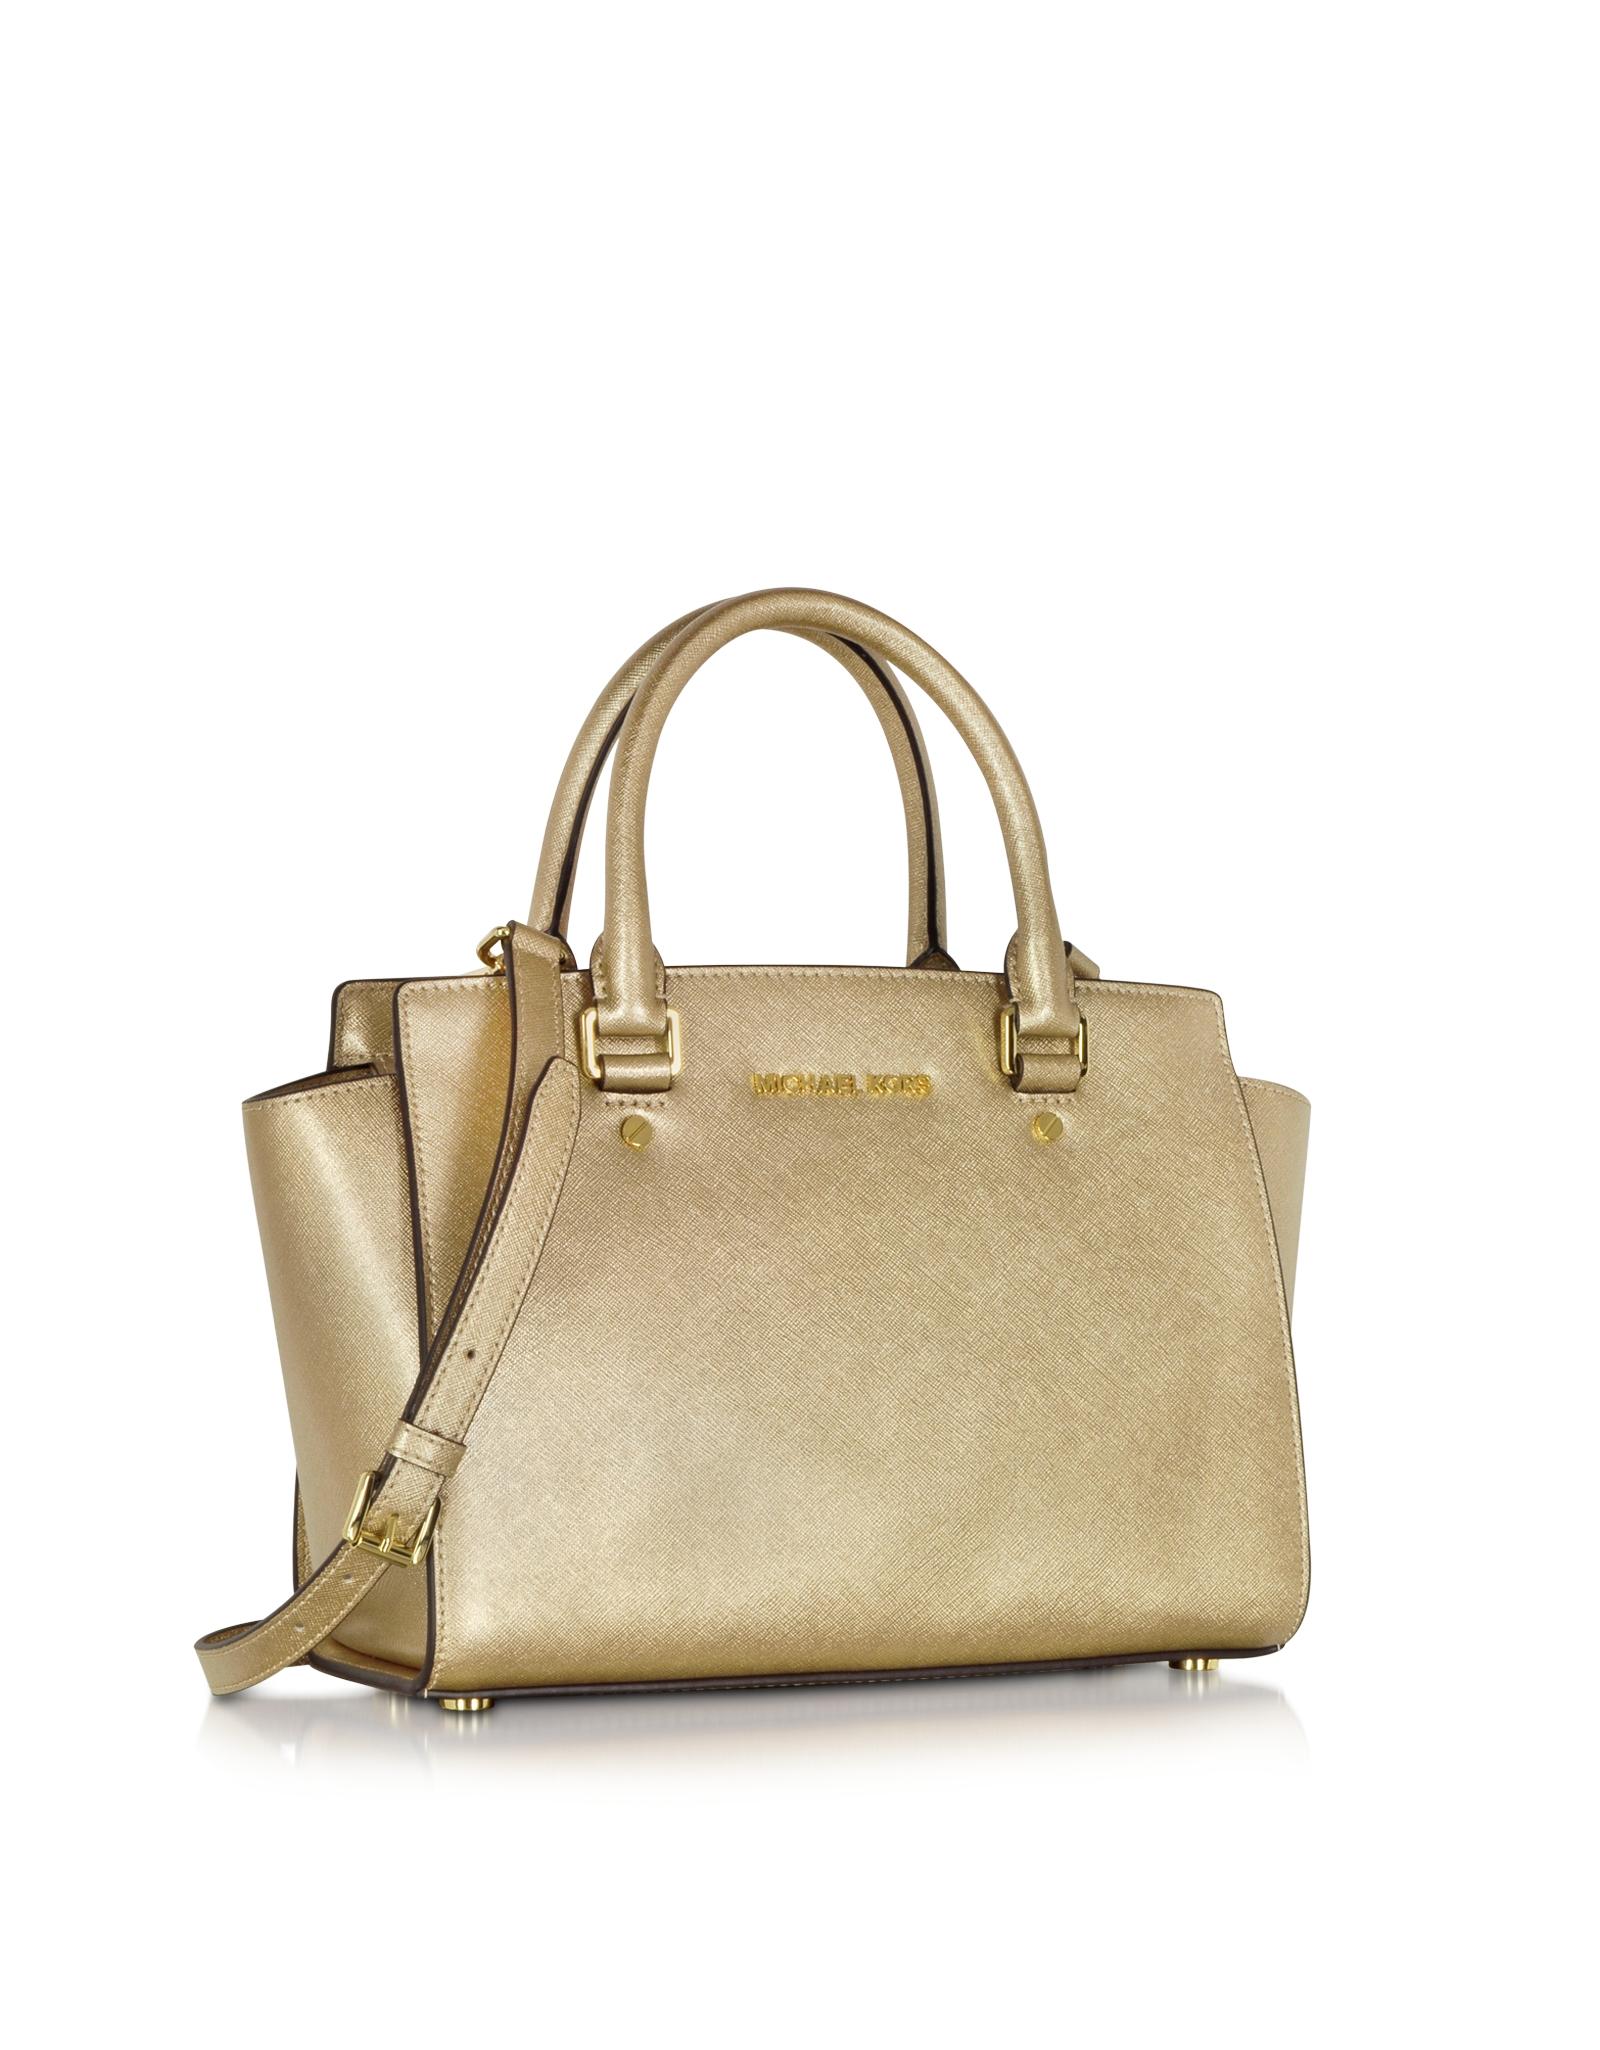 lyst michael kors selma saffiano leather medium satchel bag in rh lyst com